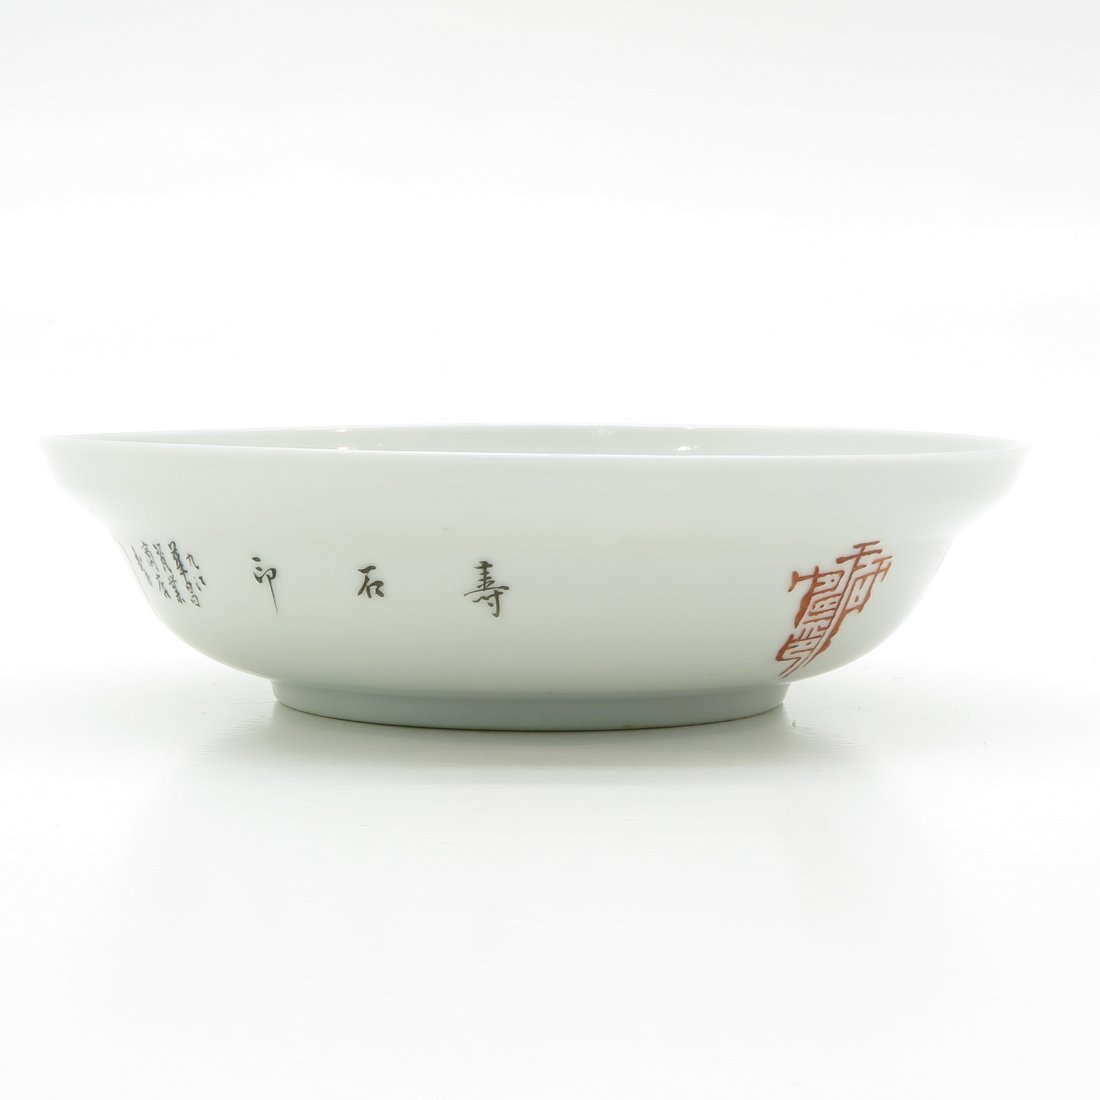 China Porcelain Bowl - 2